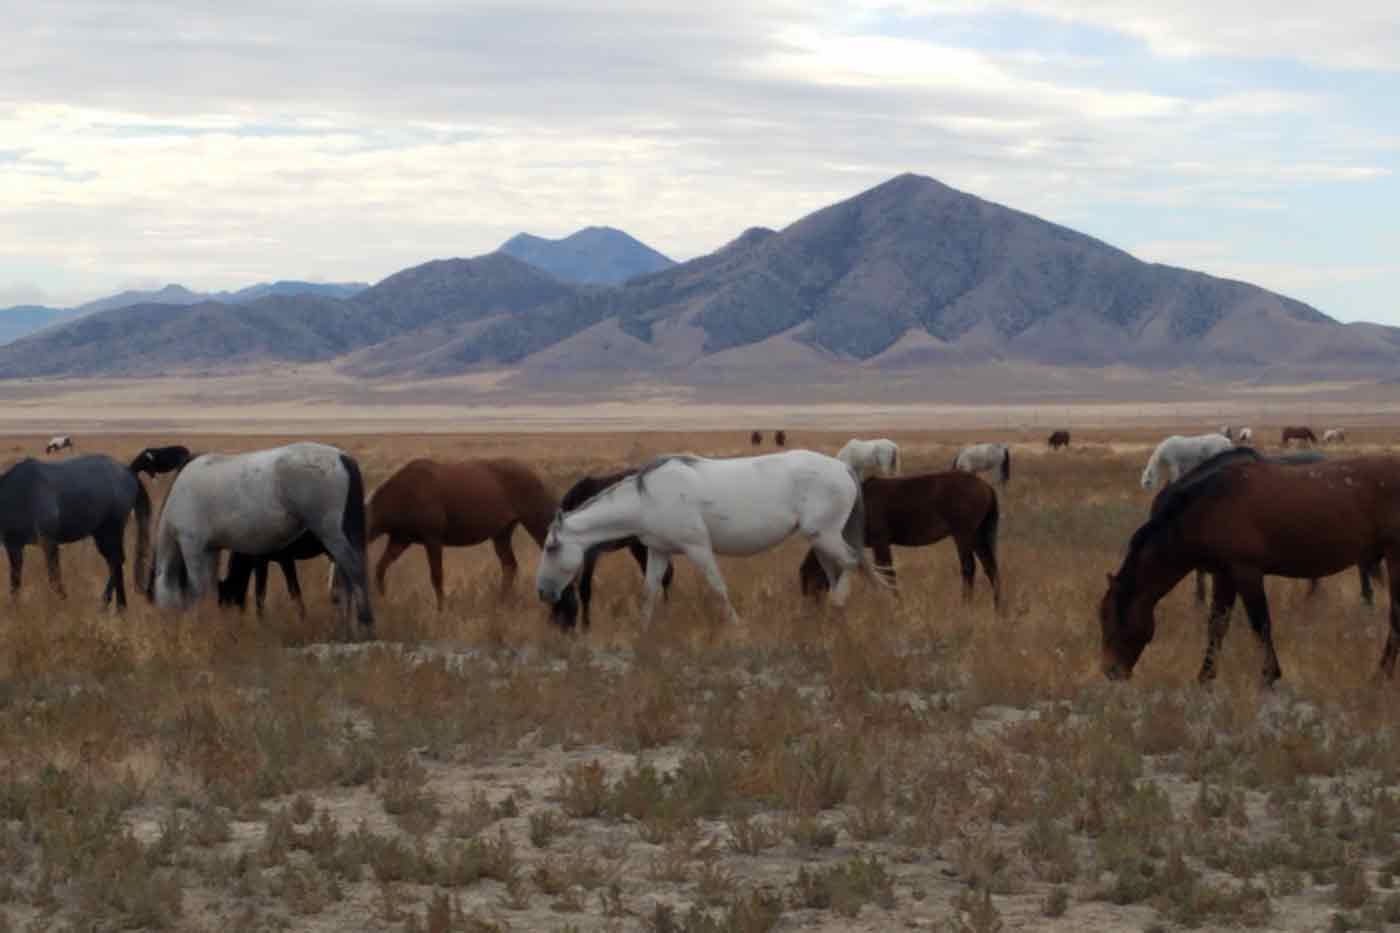 Joanna-Grossman-wild-horse-photo-of-Onaqui-herd-in-Utah-from Animal Welfare Institute